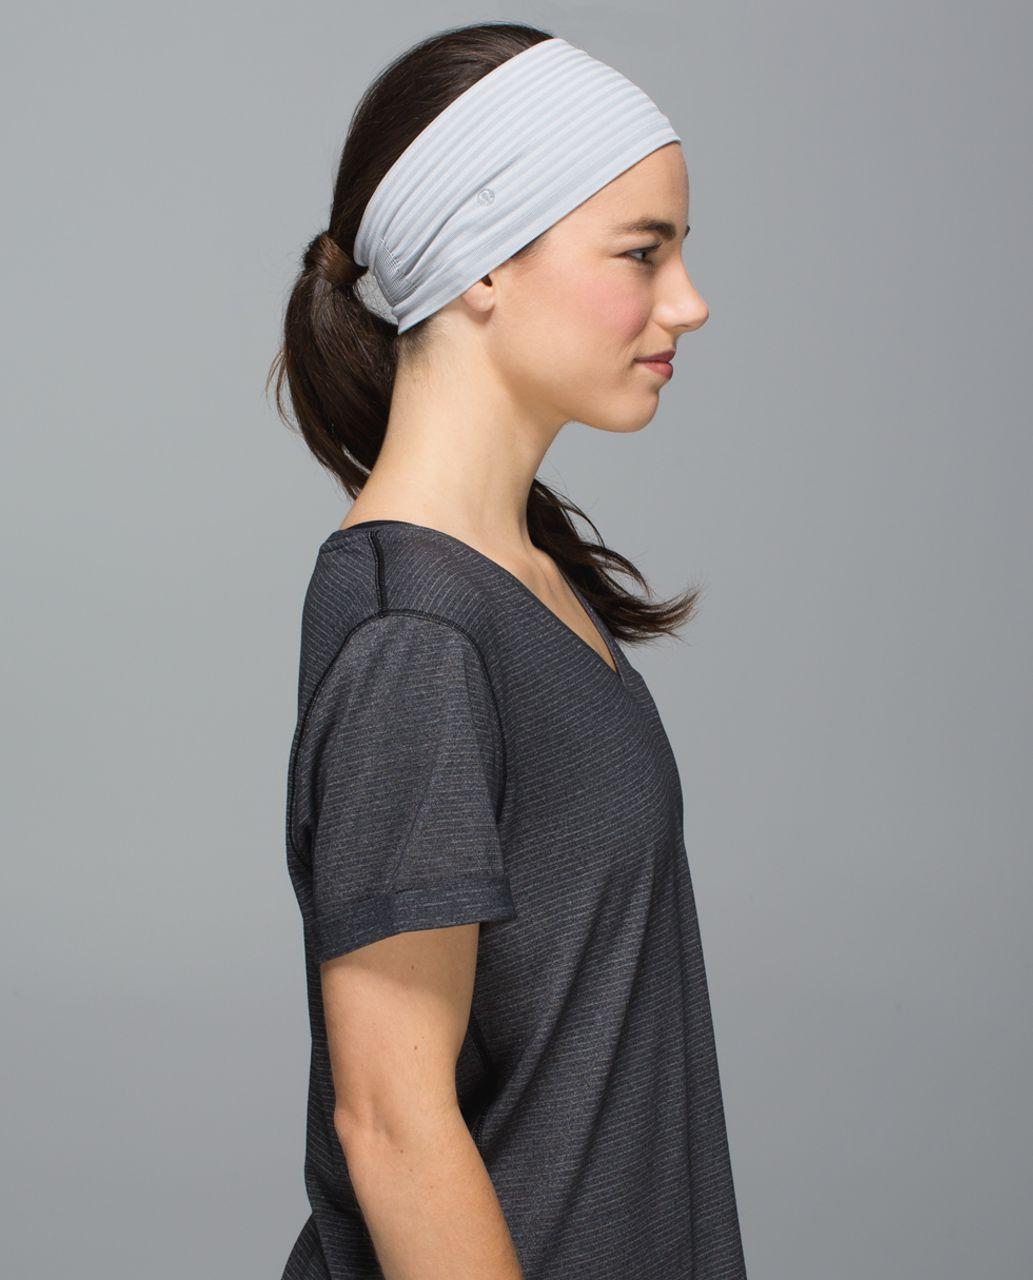 Lululemon Bangs Back Headwrap - Heathered Silver Spoon